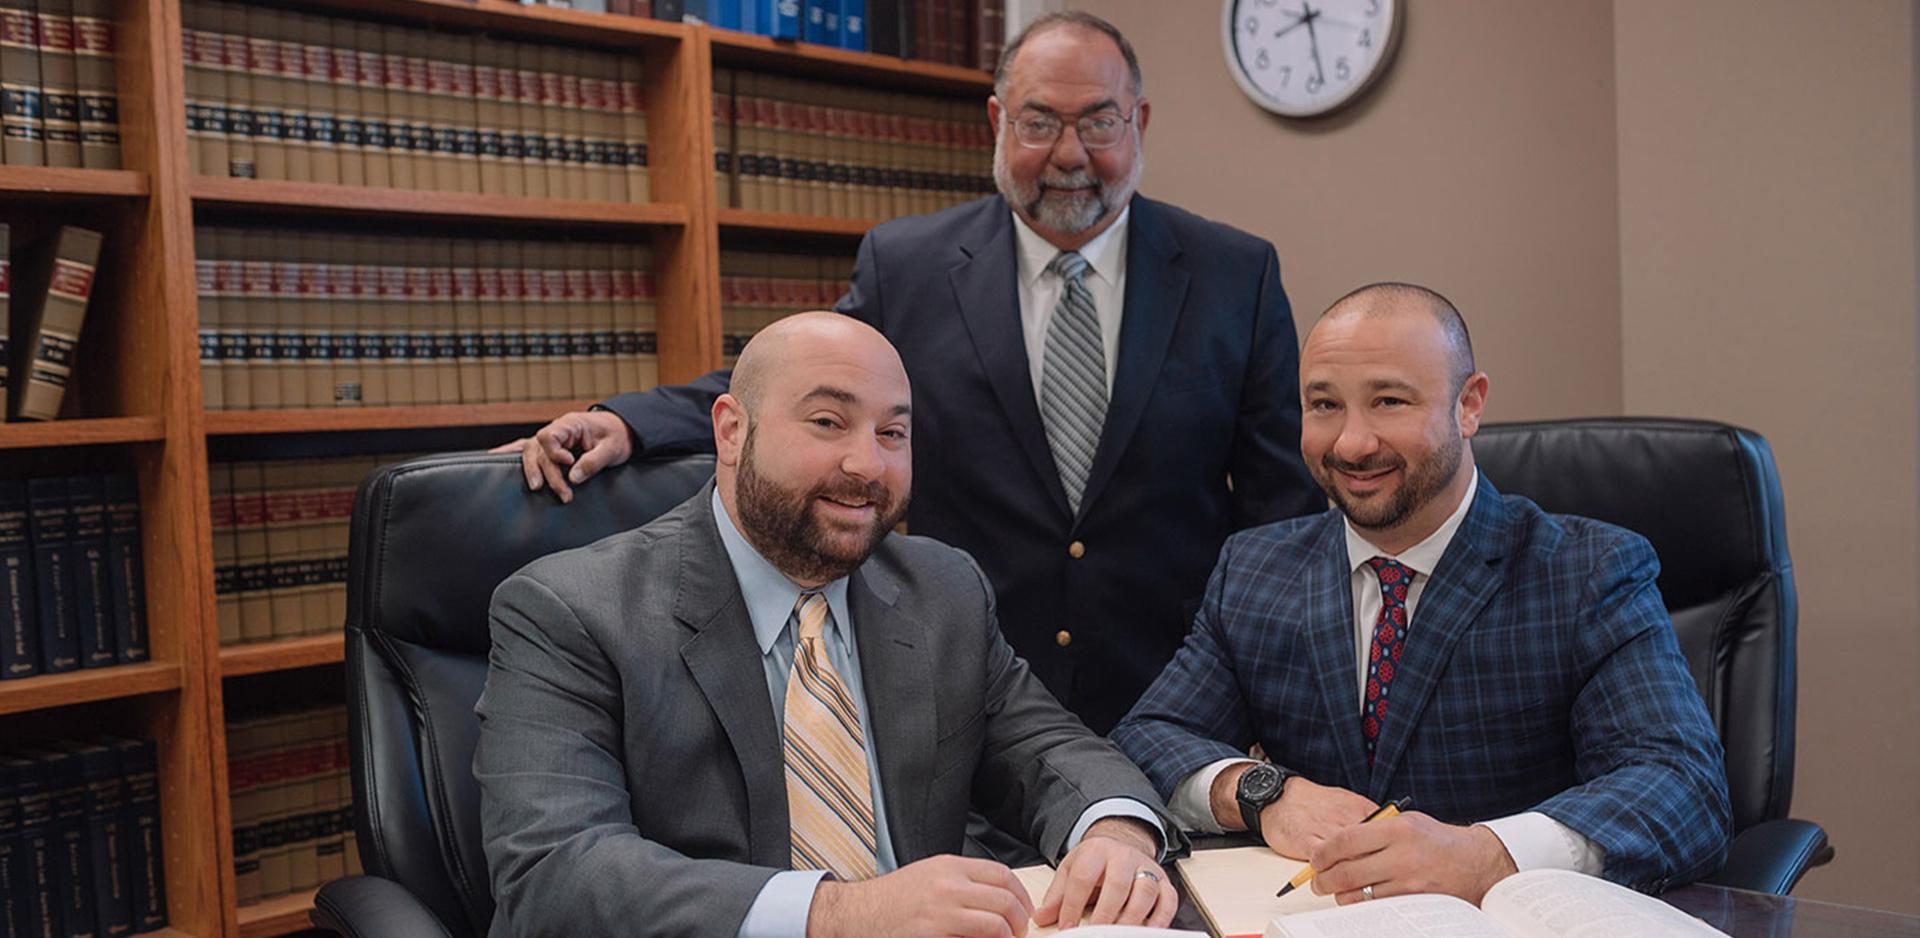 Foshee & Yaffe attorneys at law sitting at desk